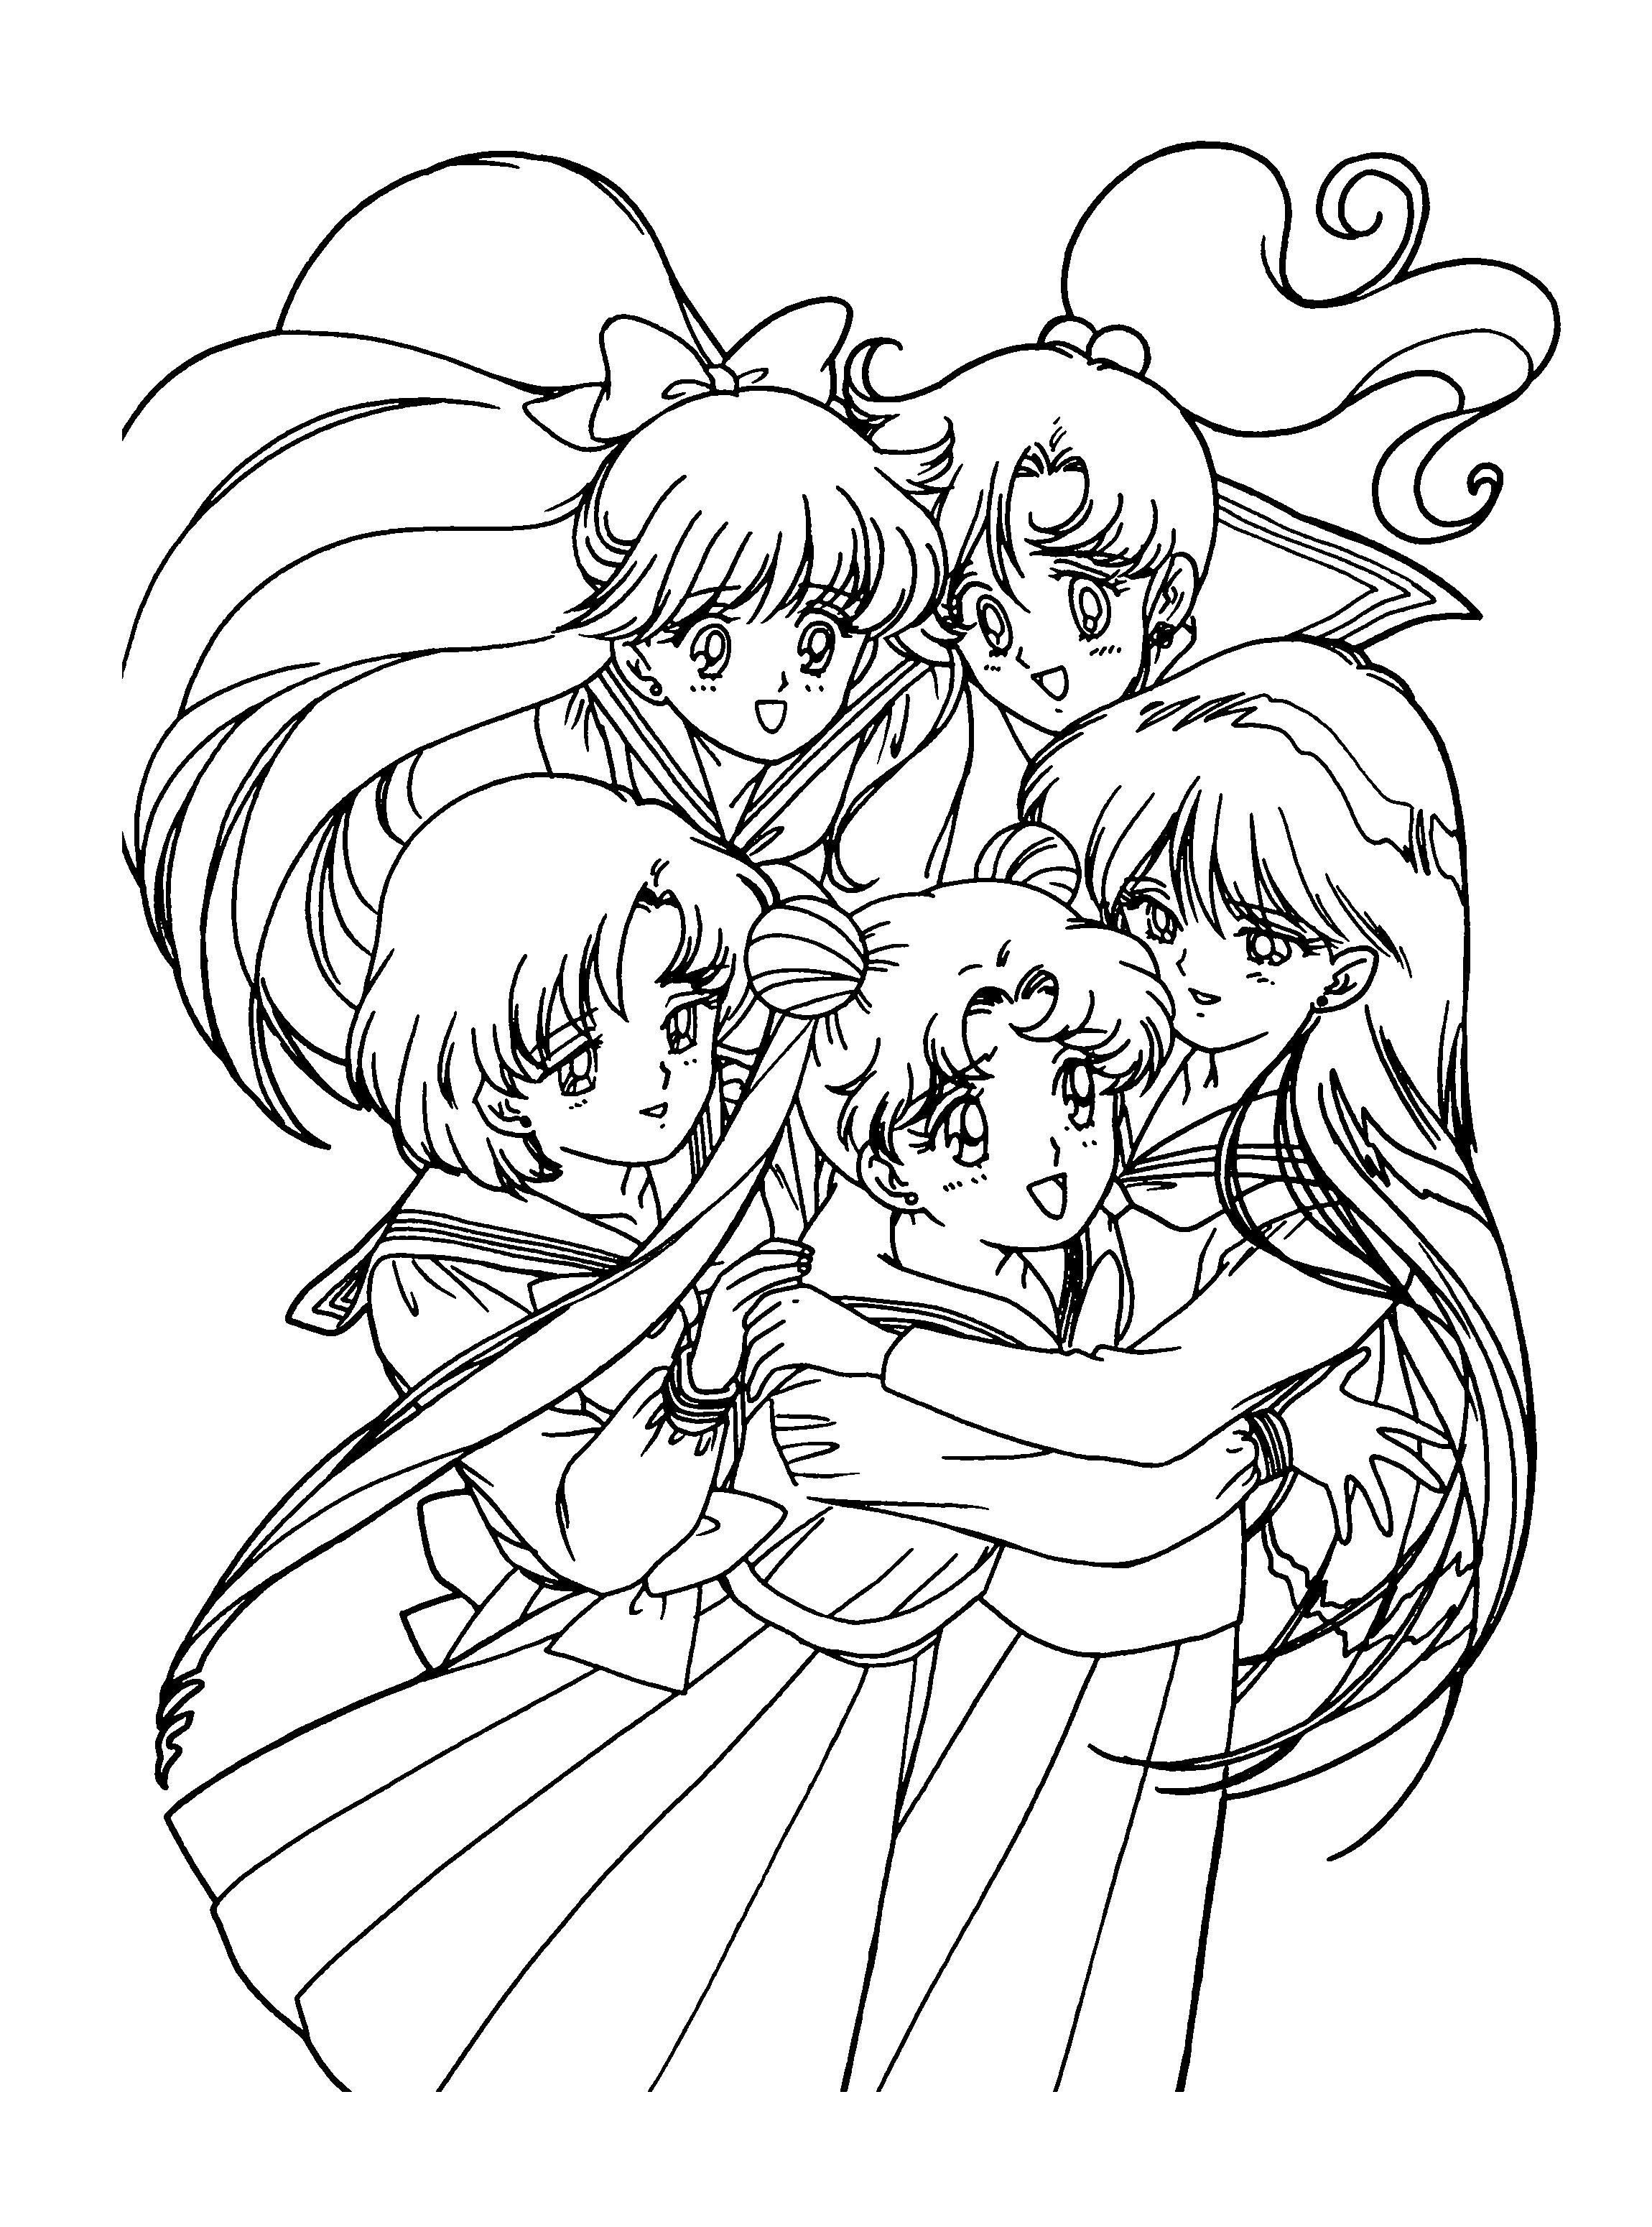 Anime Girl Ausmalbilder Einzigartig 40 Www Ausmalbilder Scoredatscore Frisch Ausmalbilder Anime Girl Stock